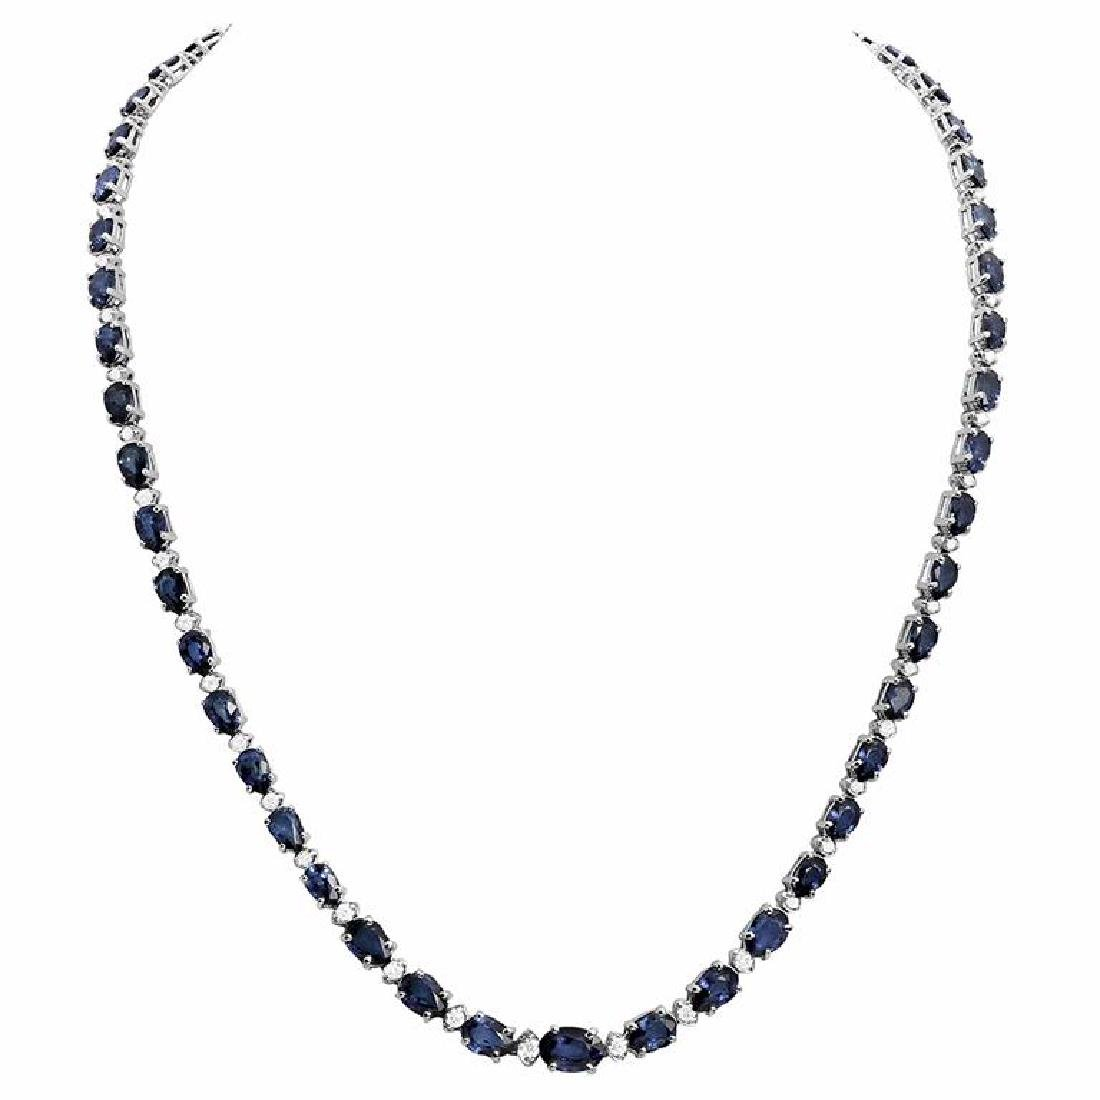 14k White Gold 23.90ct Sapphire 1.09ct Diamond Necklace